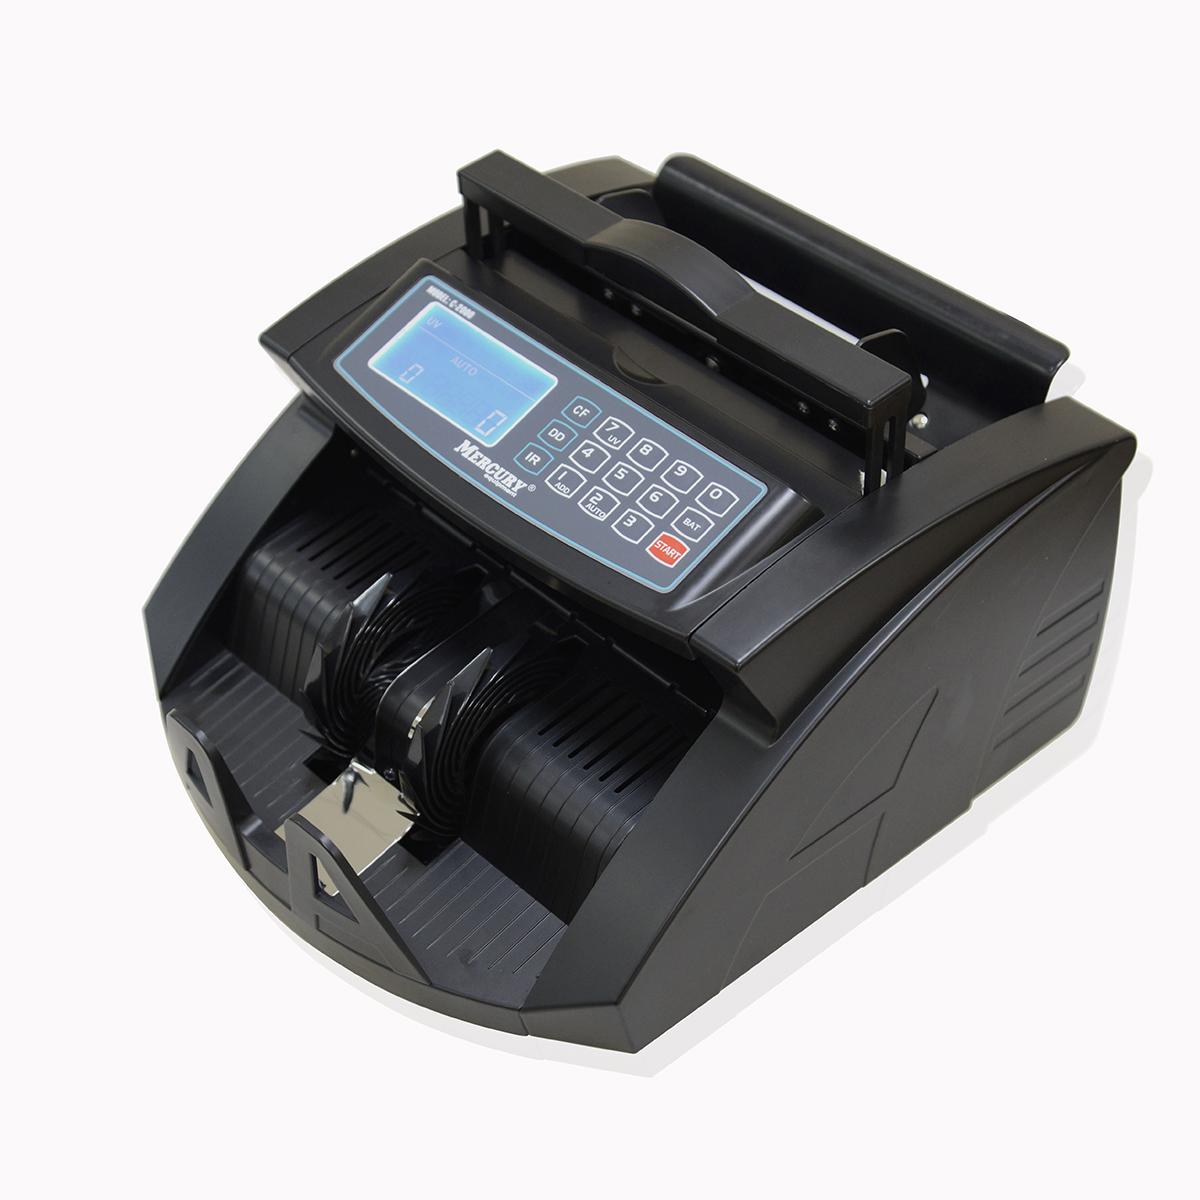 Мультивалютный счетчик банкнот Mercury C — 2000 UV Black